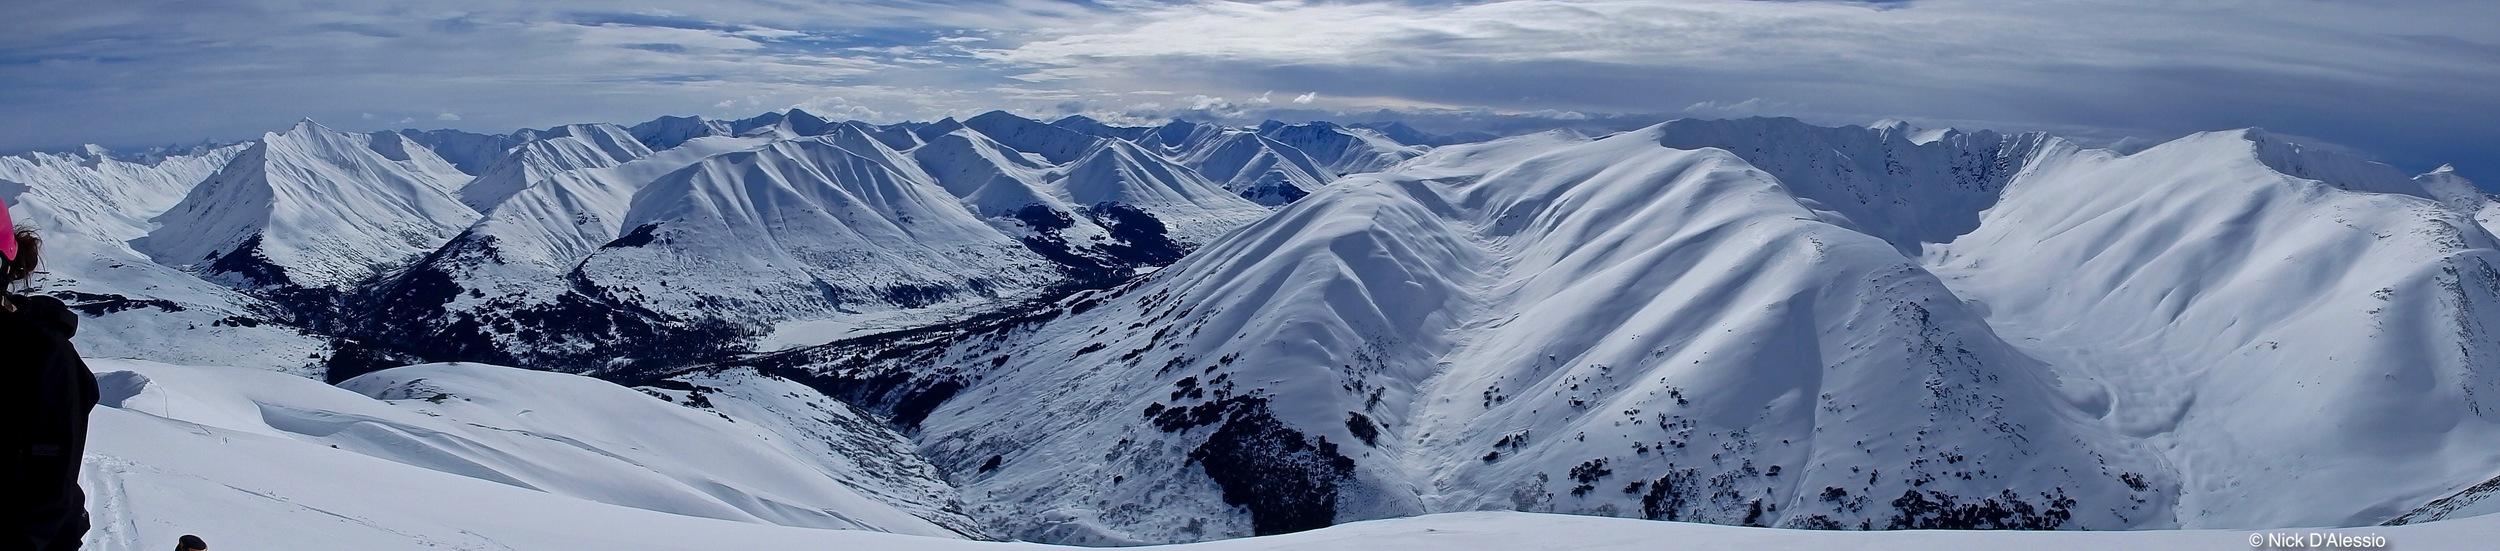 Alaska ski terrain, Remarkable Adventures